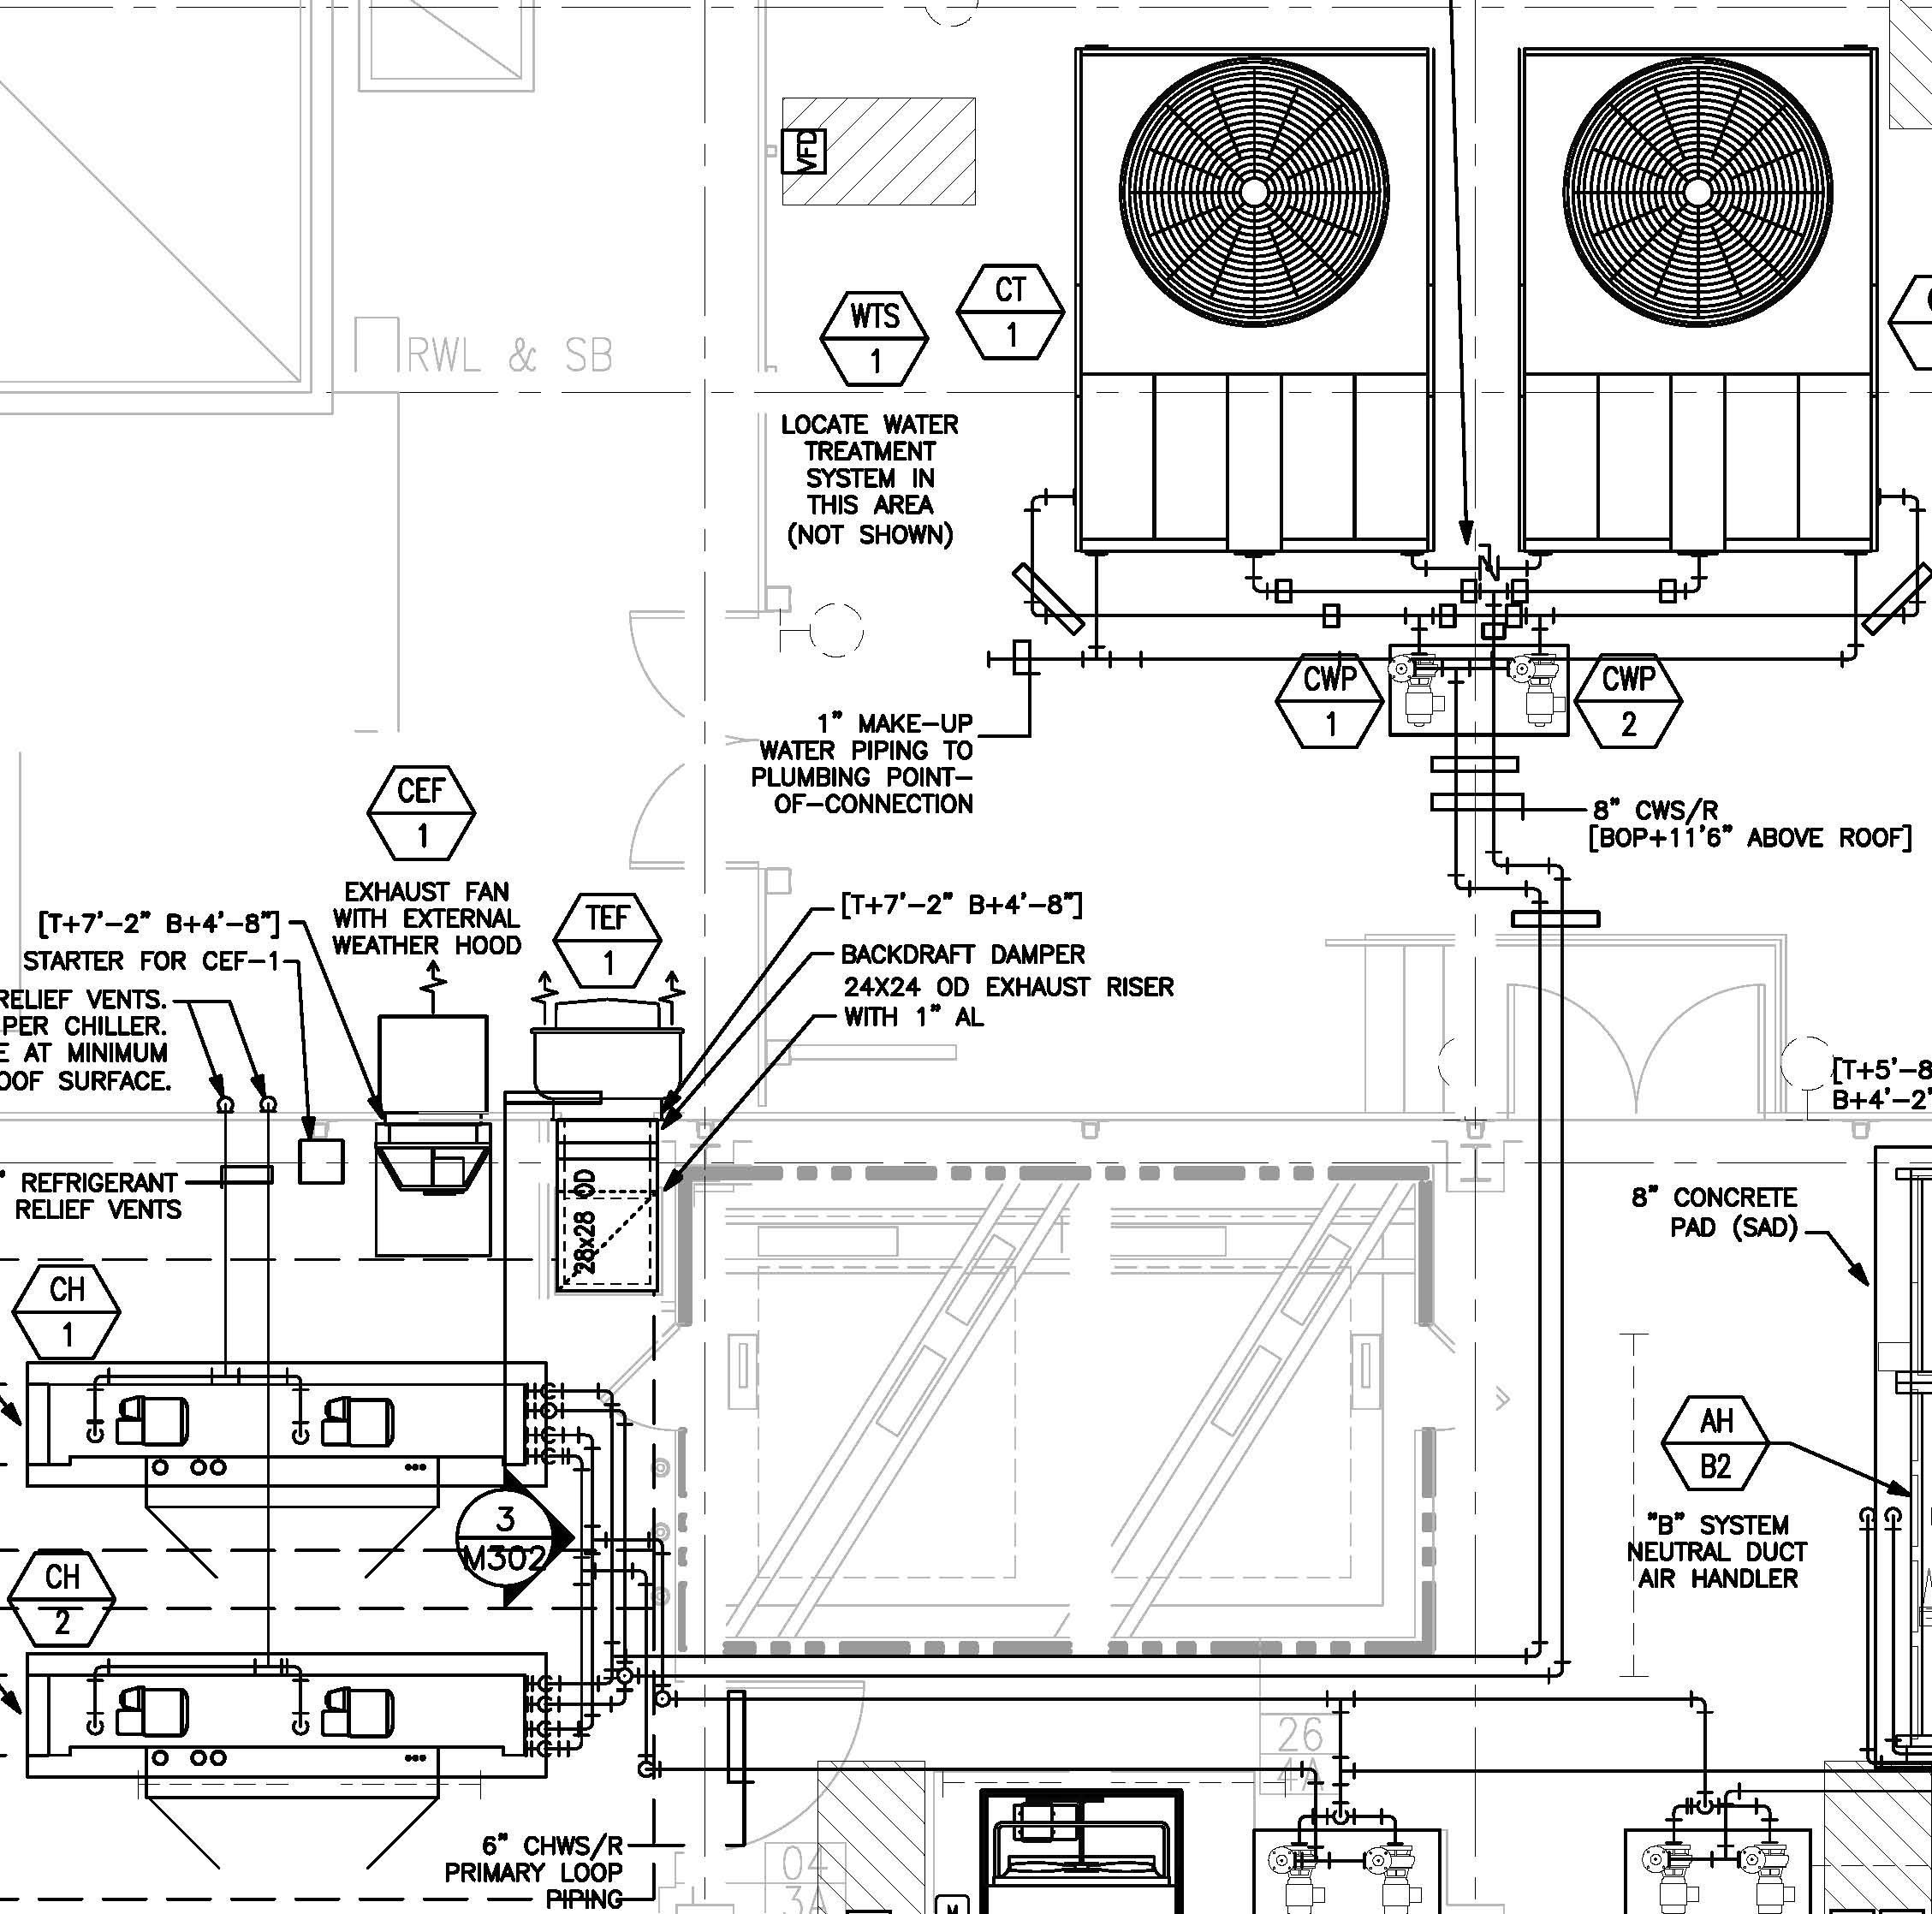 Broan Range Hood Wiring Diagram Bathroom Vent Fan Wiring Diagram New Wiring Diagram for Bathroom Fan